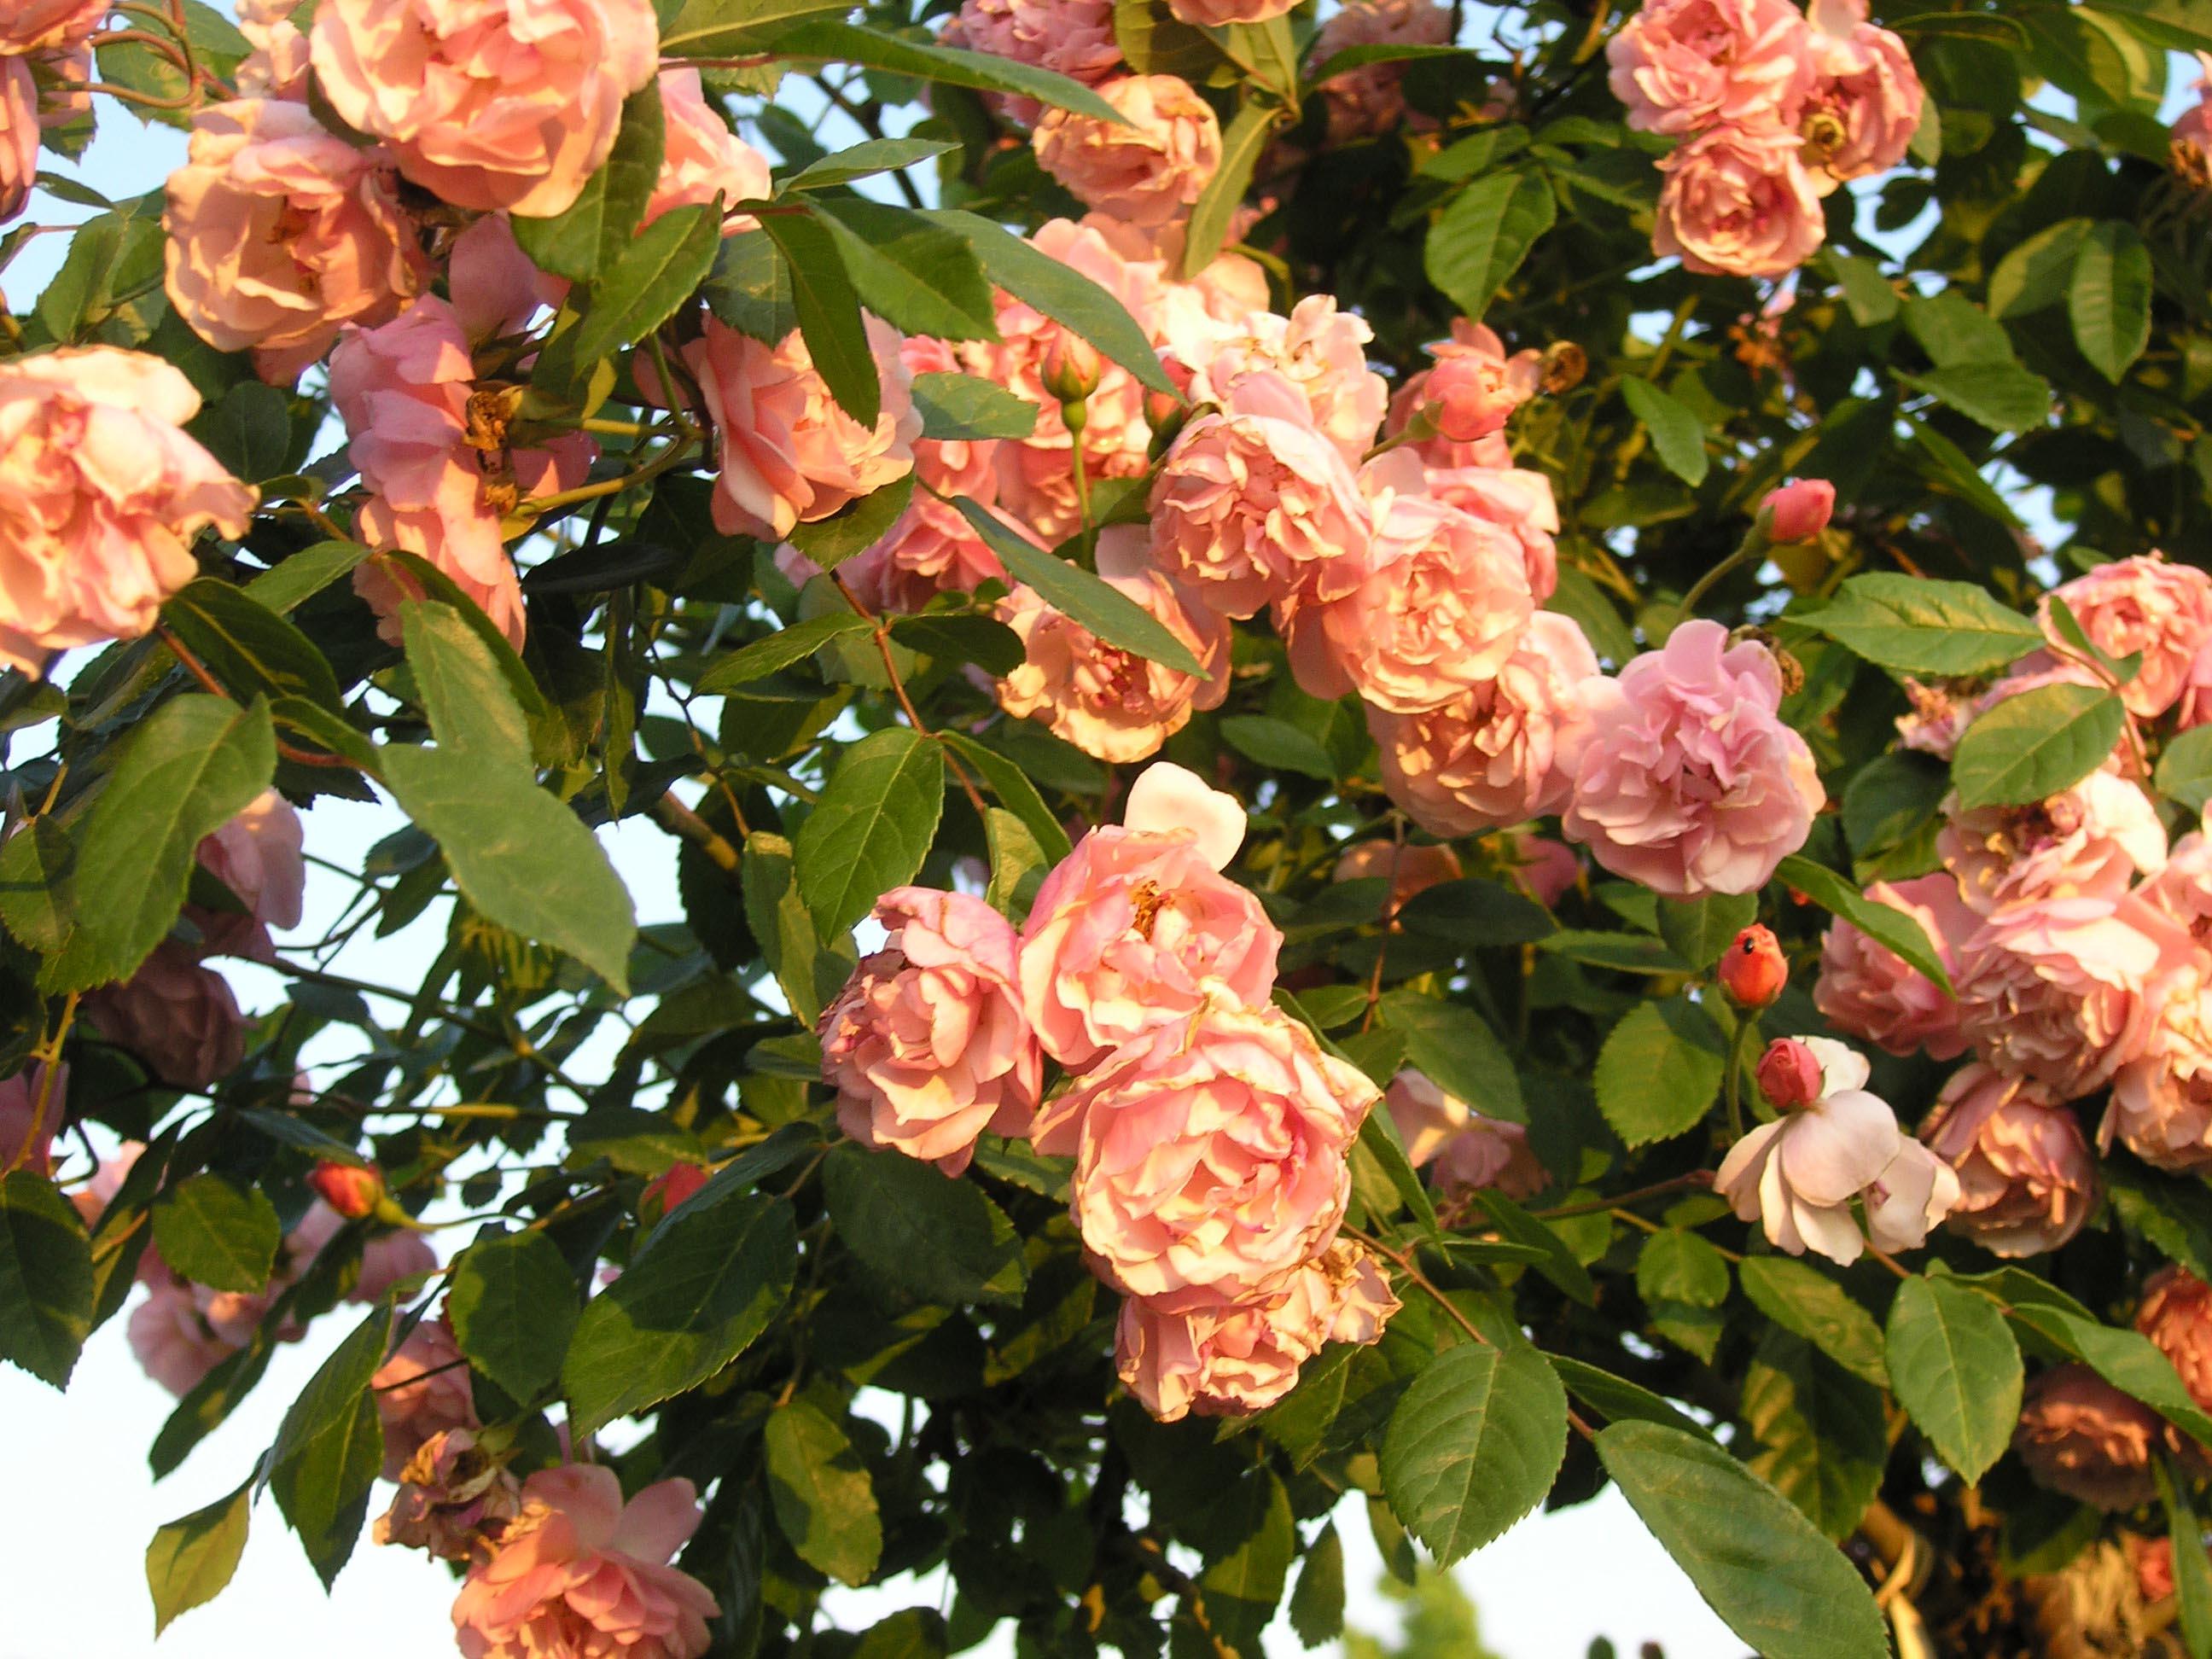 rosa-antica-cornelia-3371